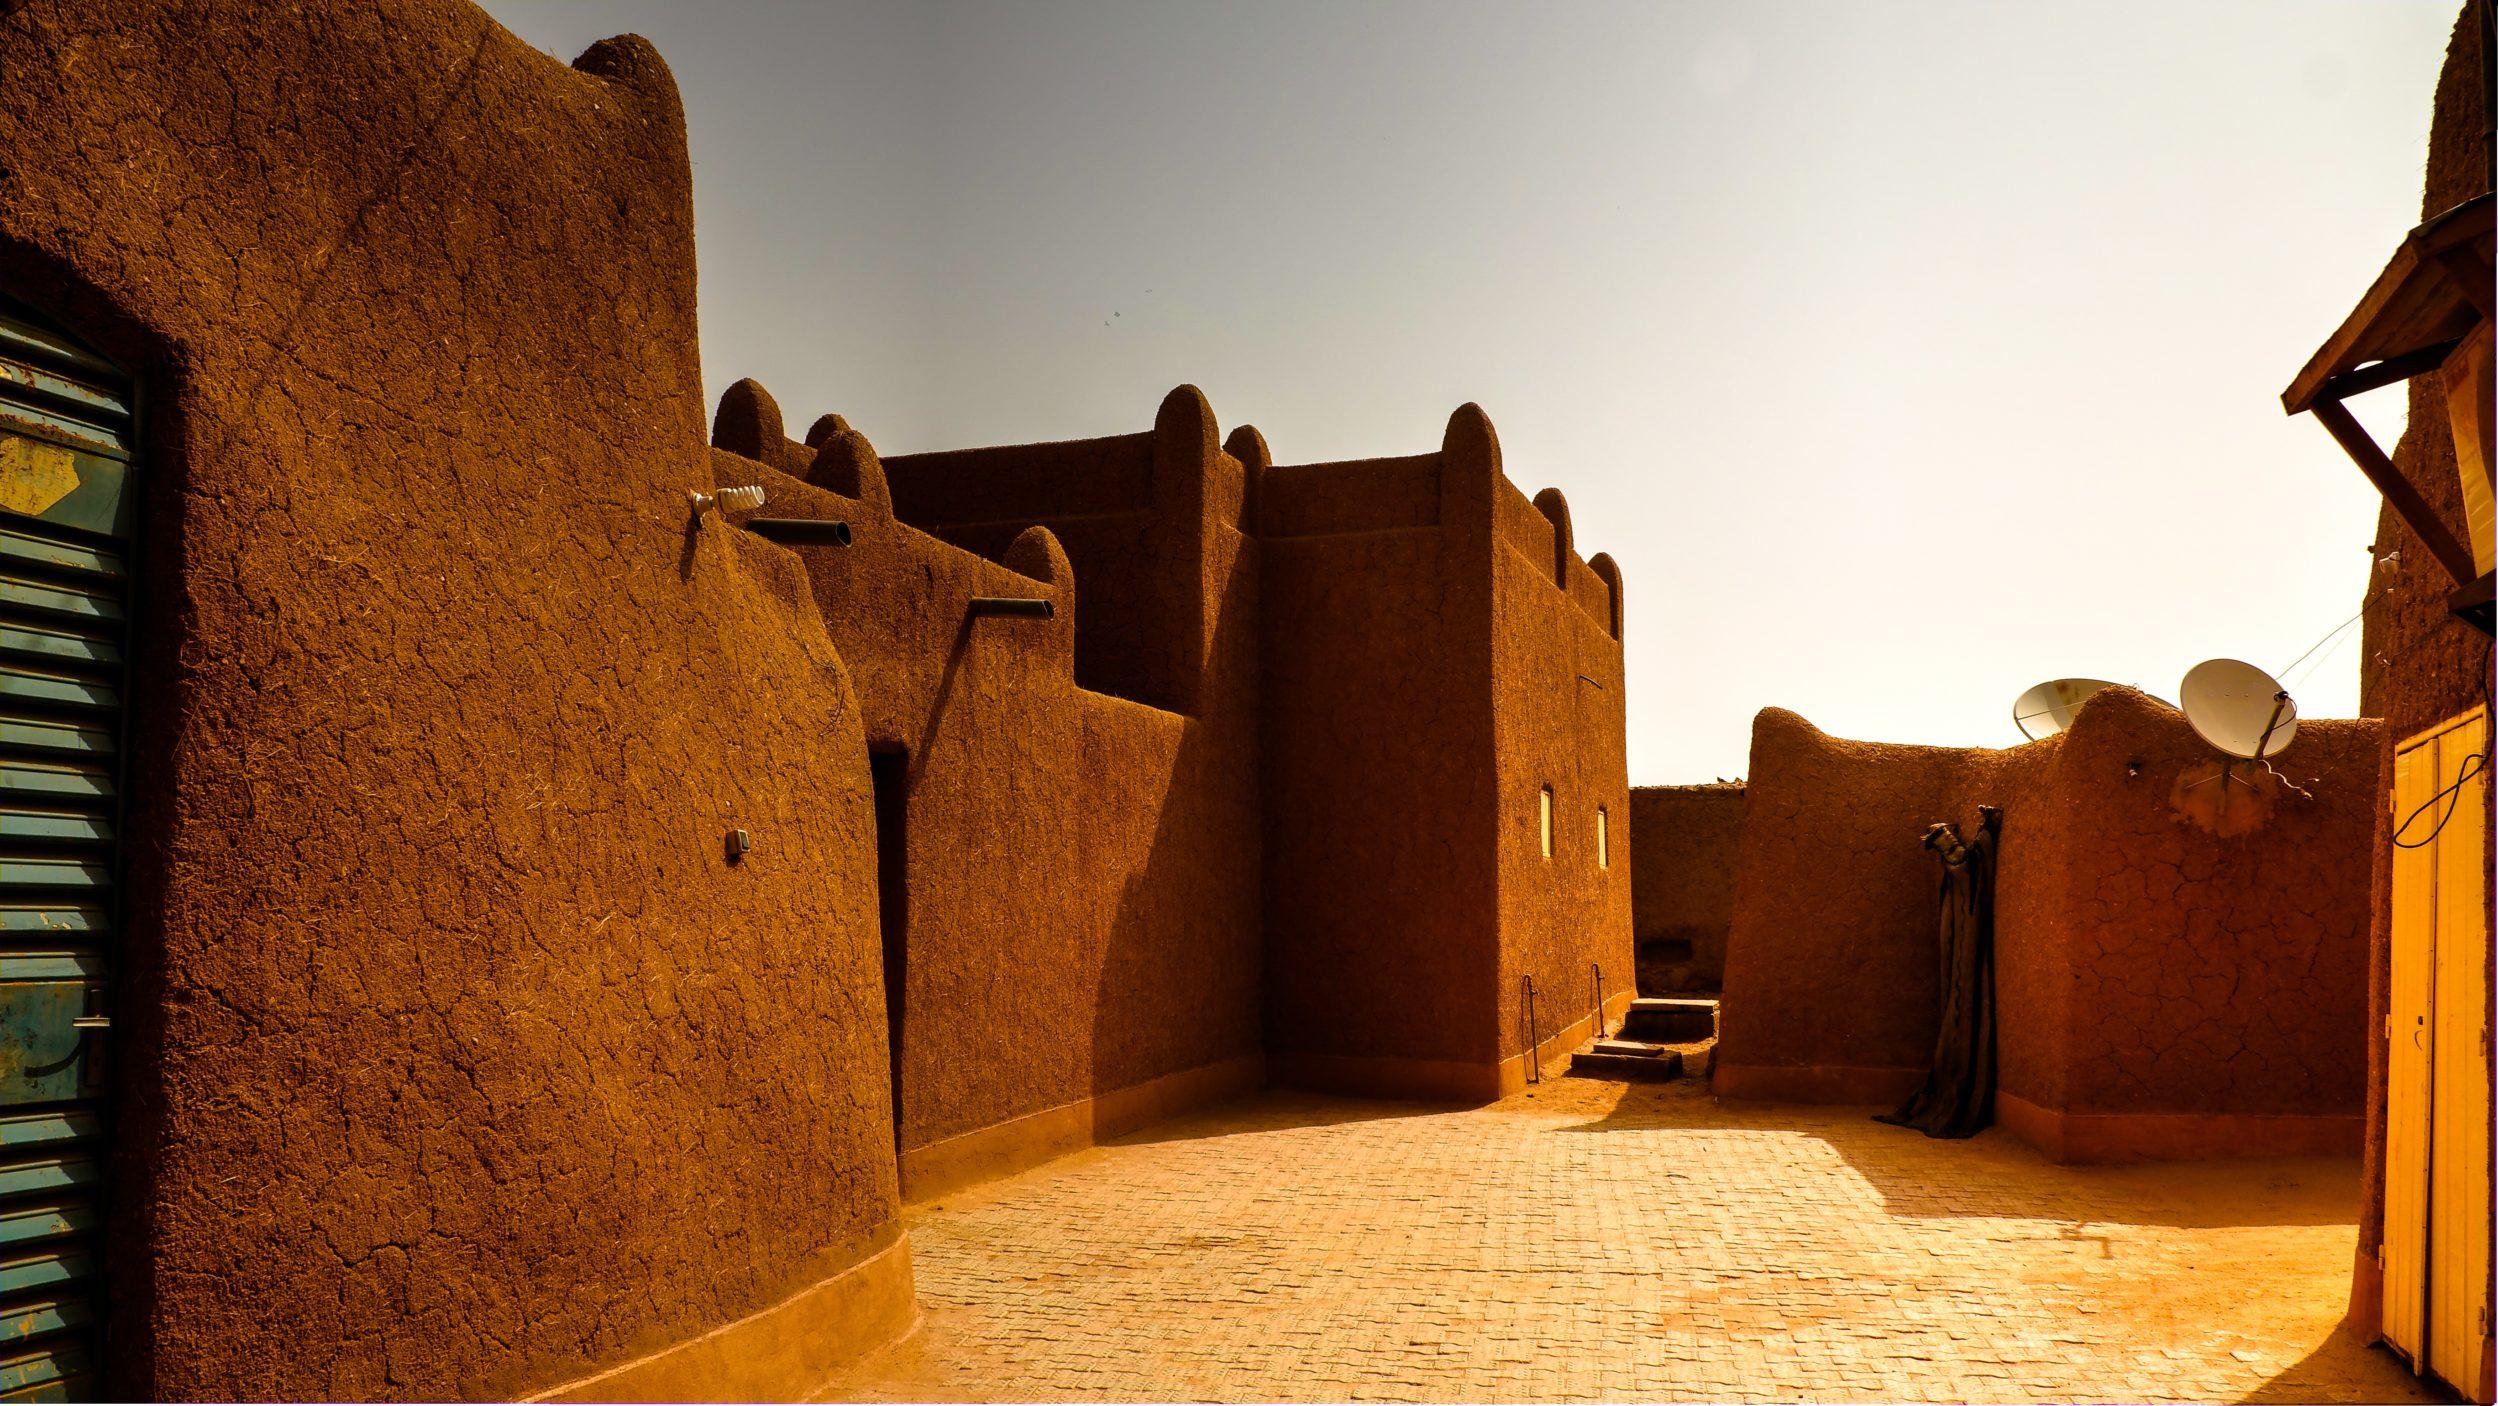 Niger [shutterstock]